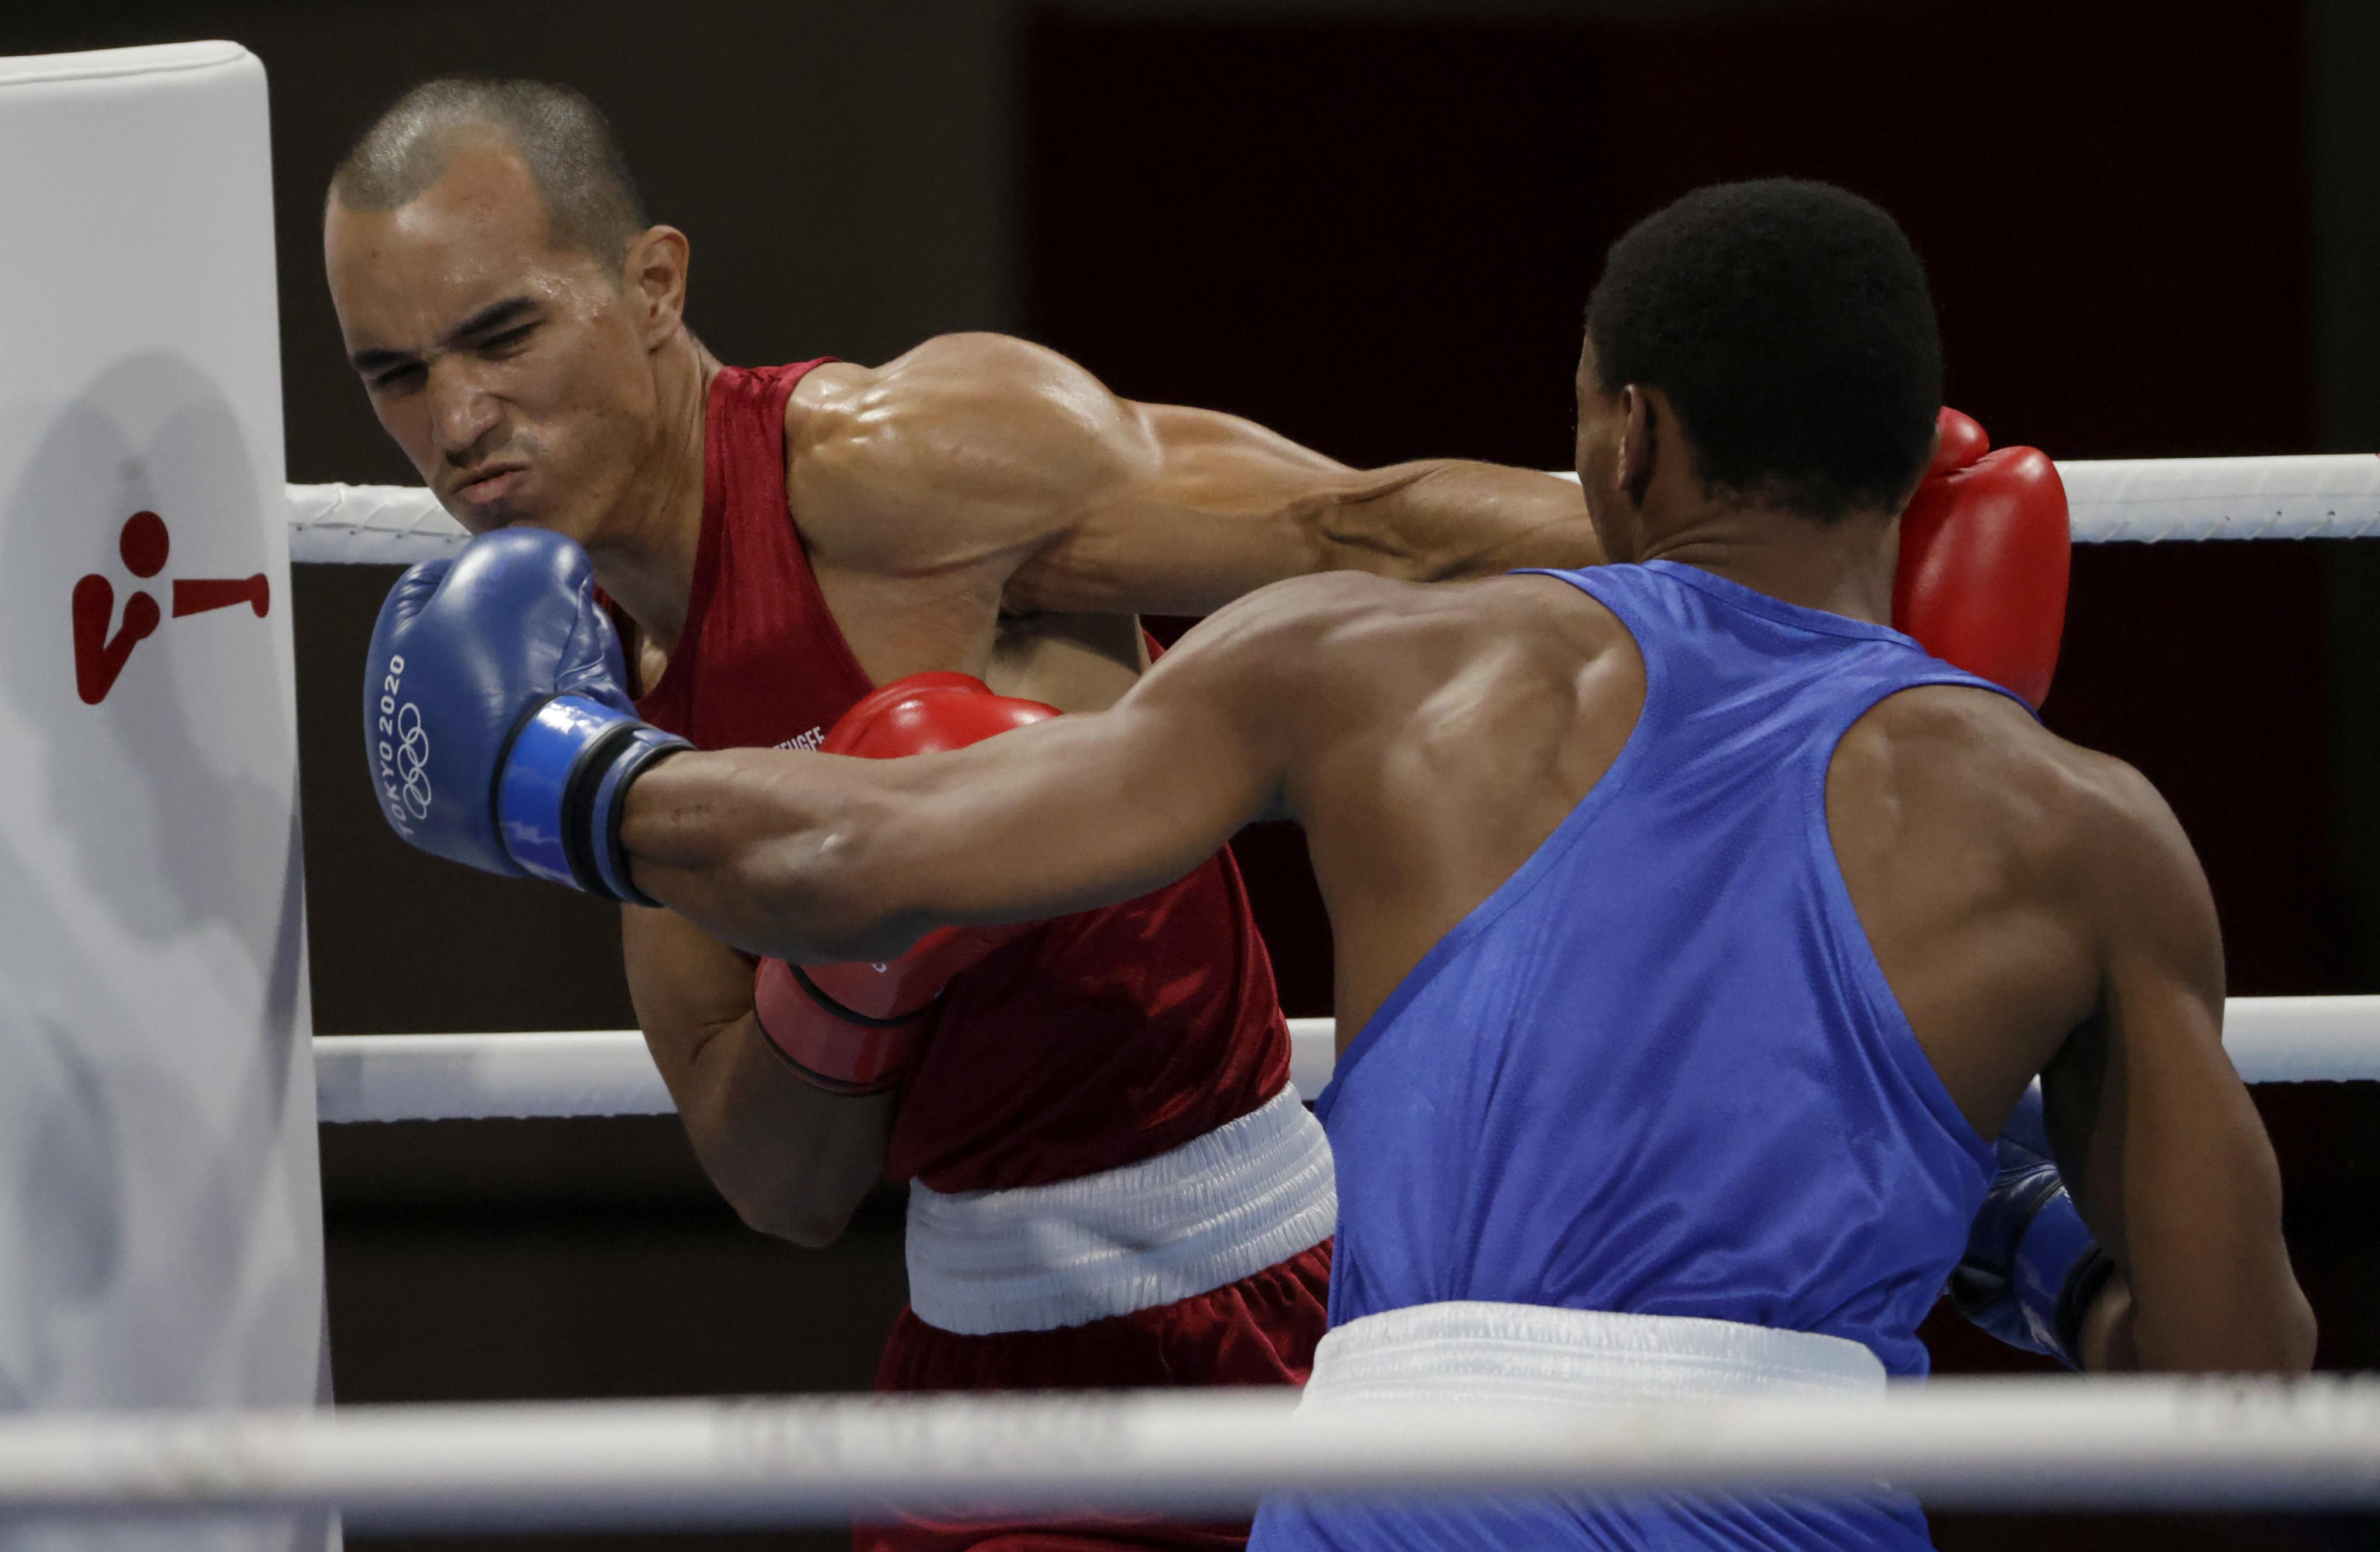 Tokyo 2020 Olympics - Boxing - Men's Middleweight - Last 32 - Kokugikan Arena - Tokyo, Japan